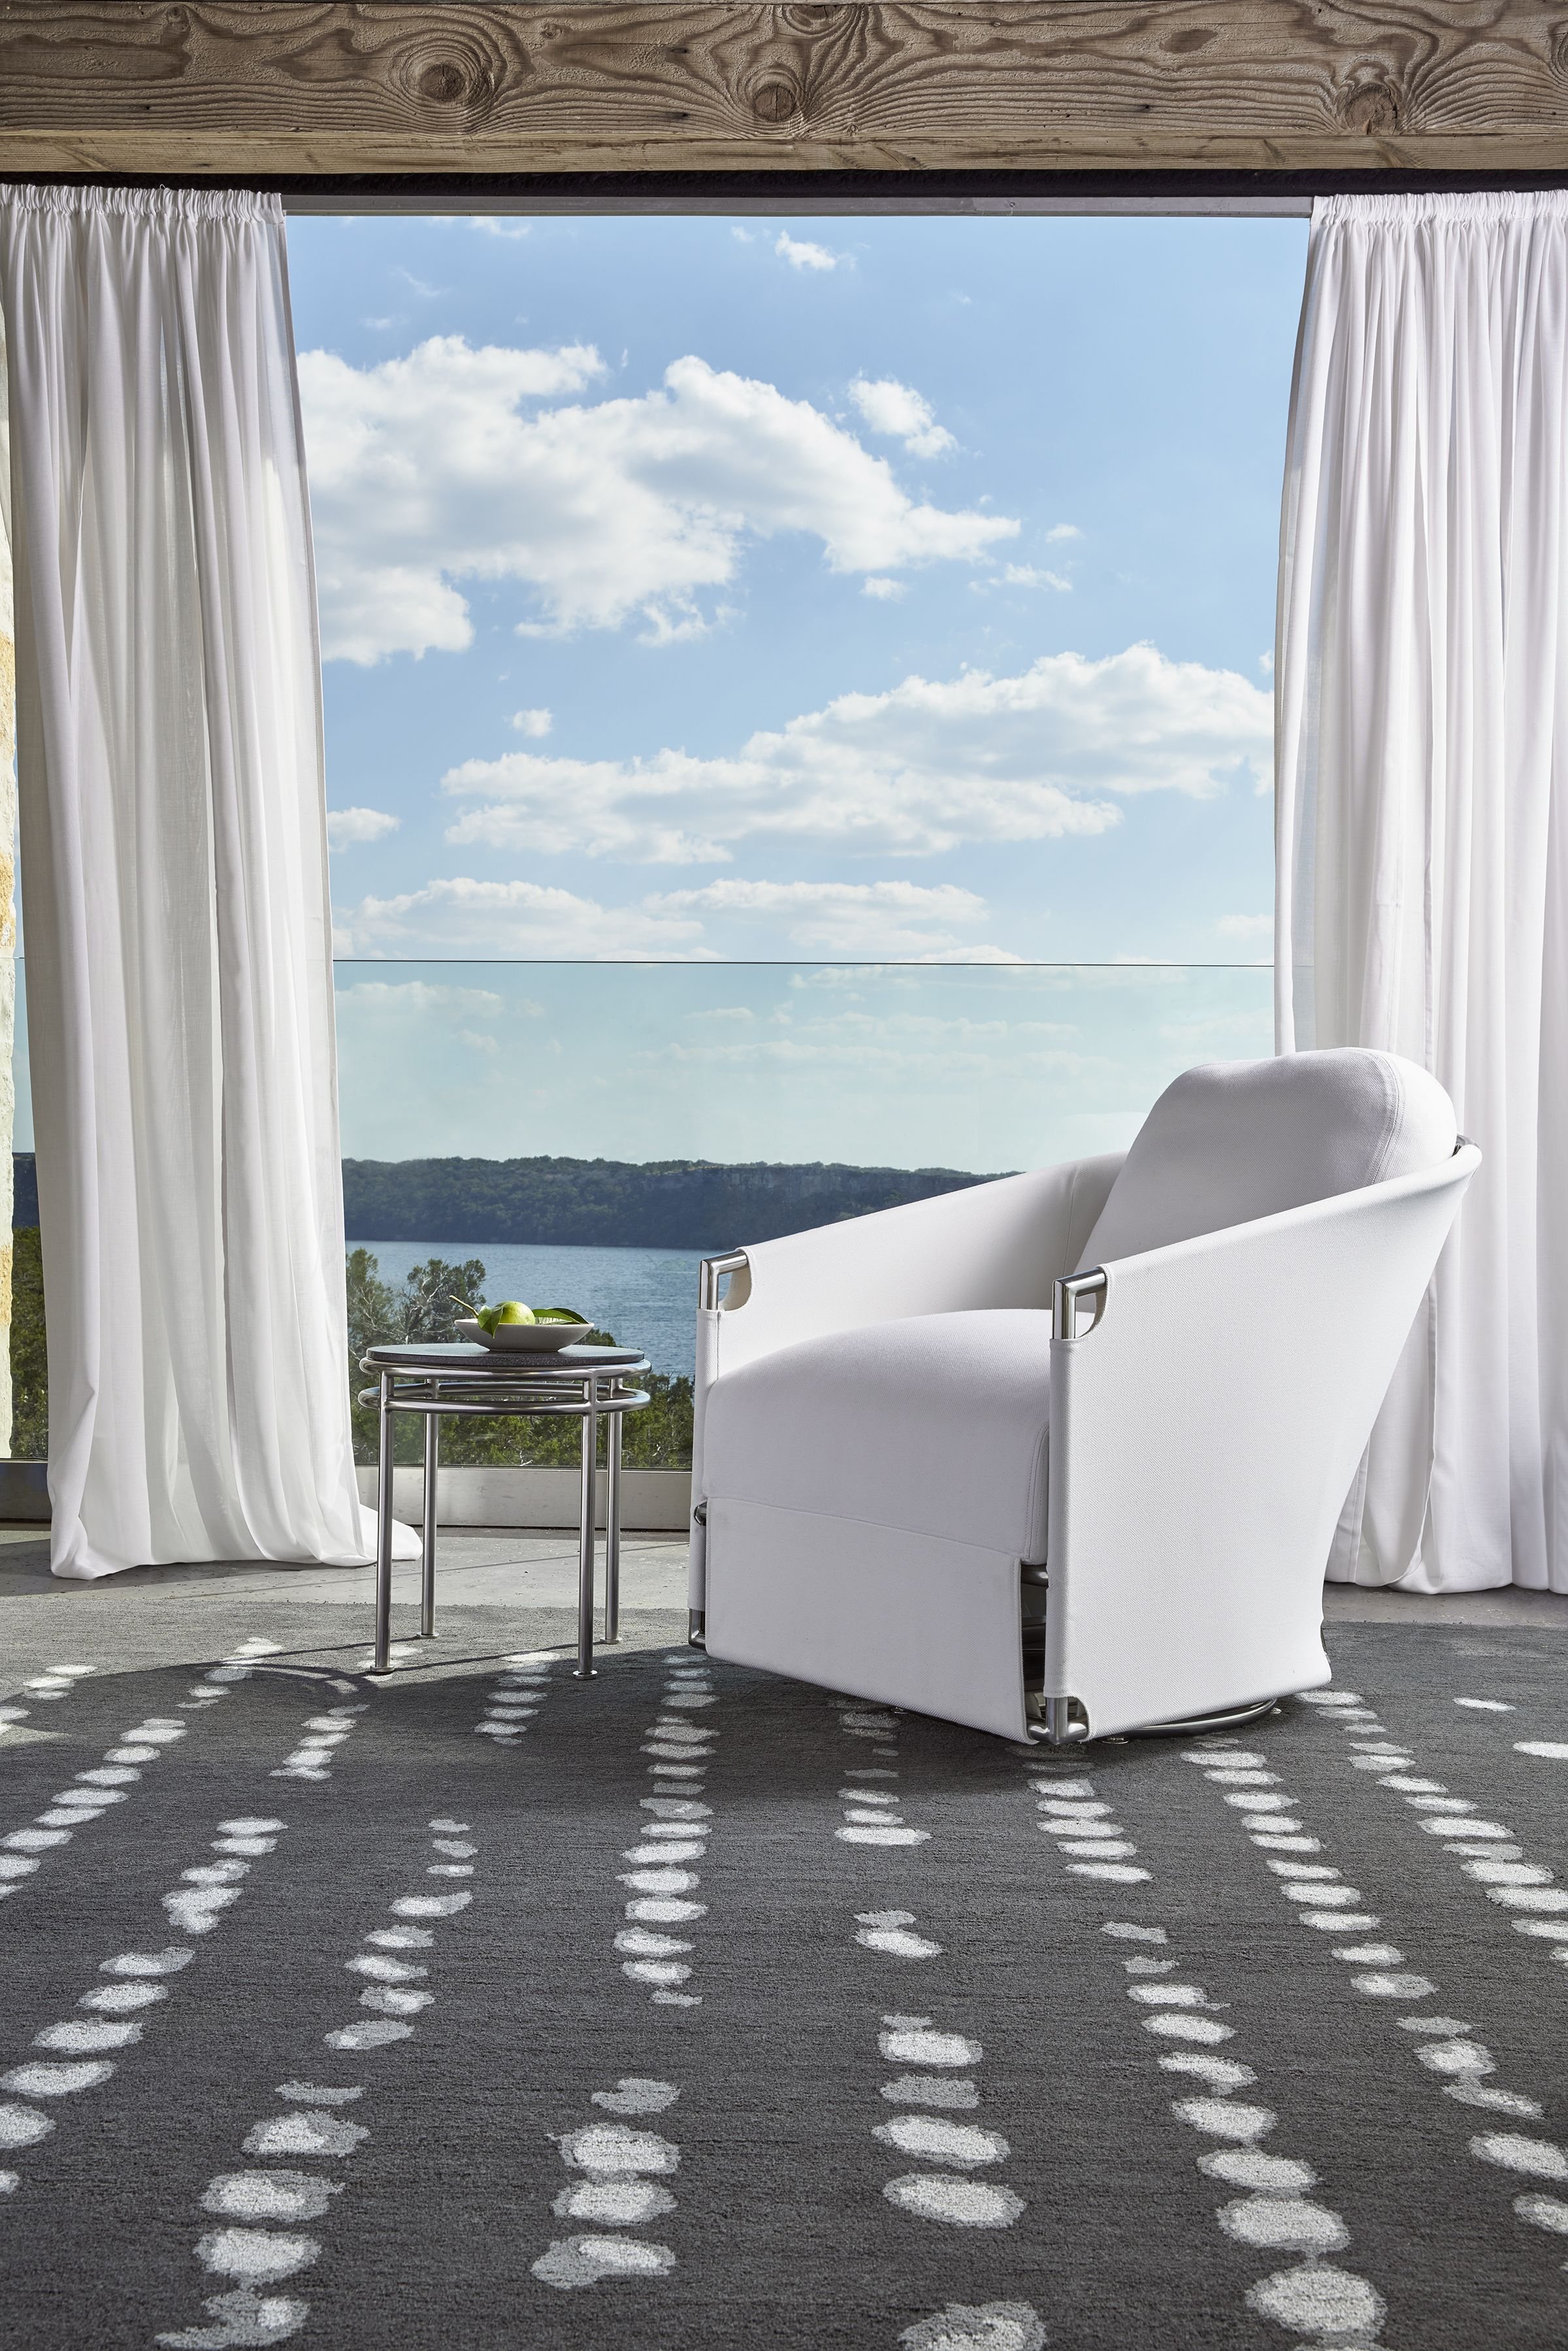 Mariner 316 Lounge Chair From David Sutherland  Http://www.sutherlandfurniture.com